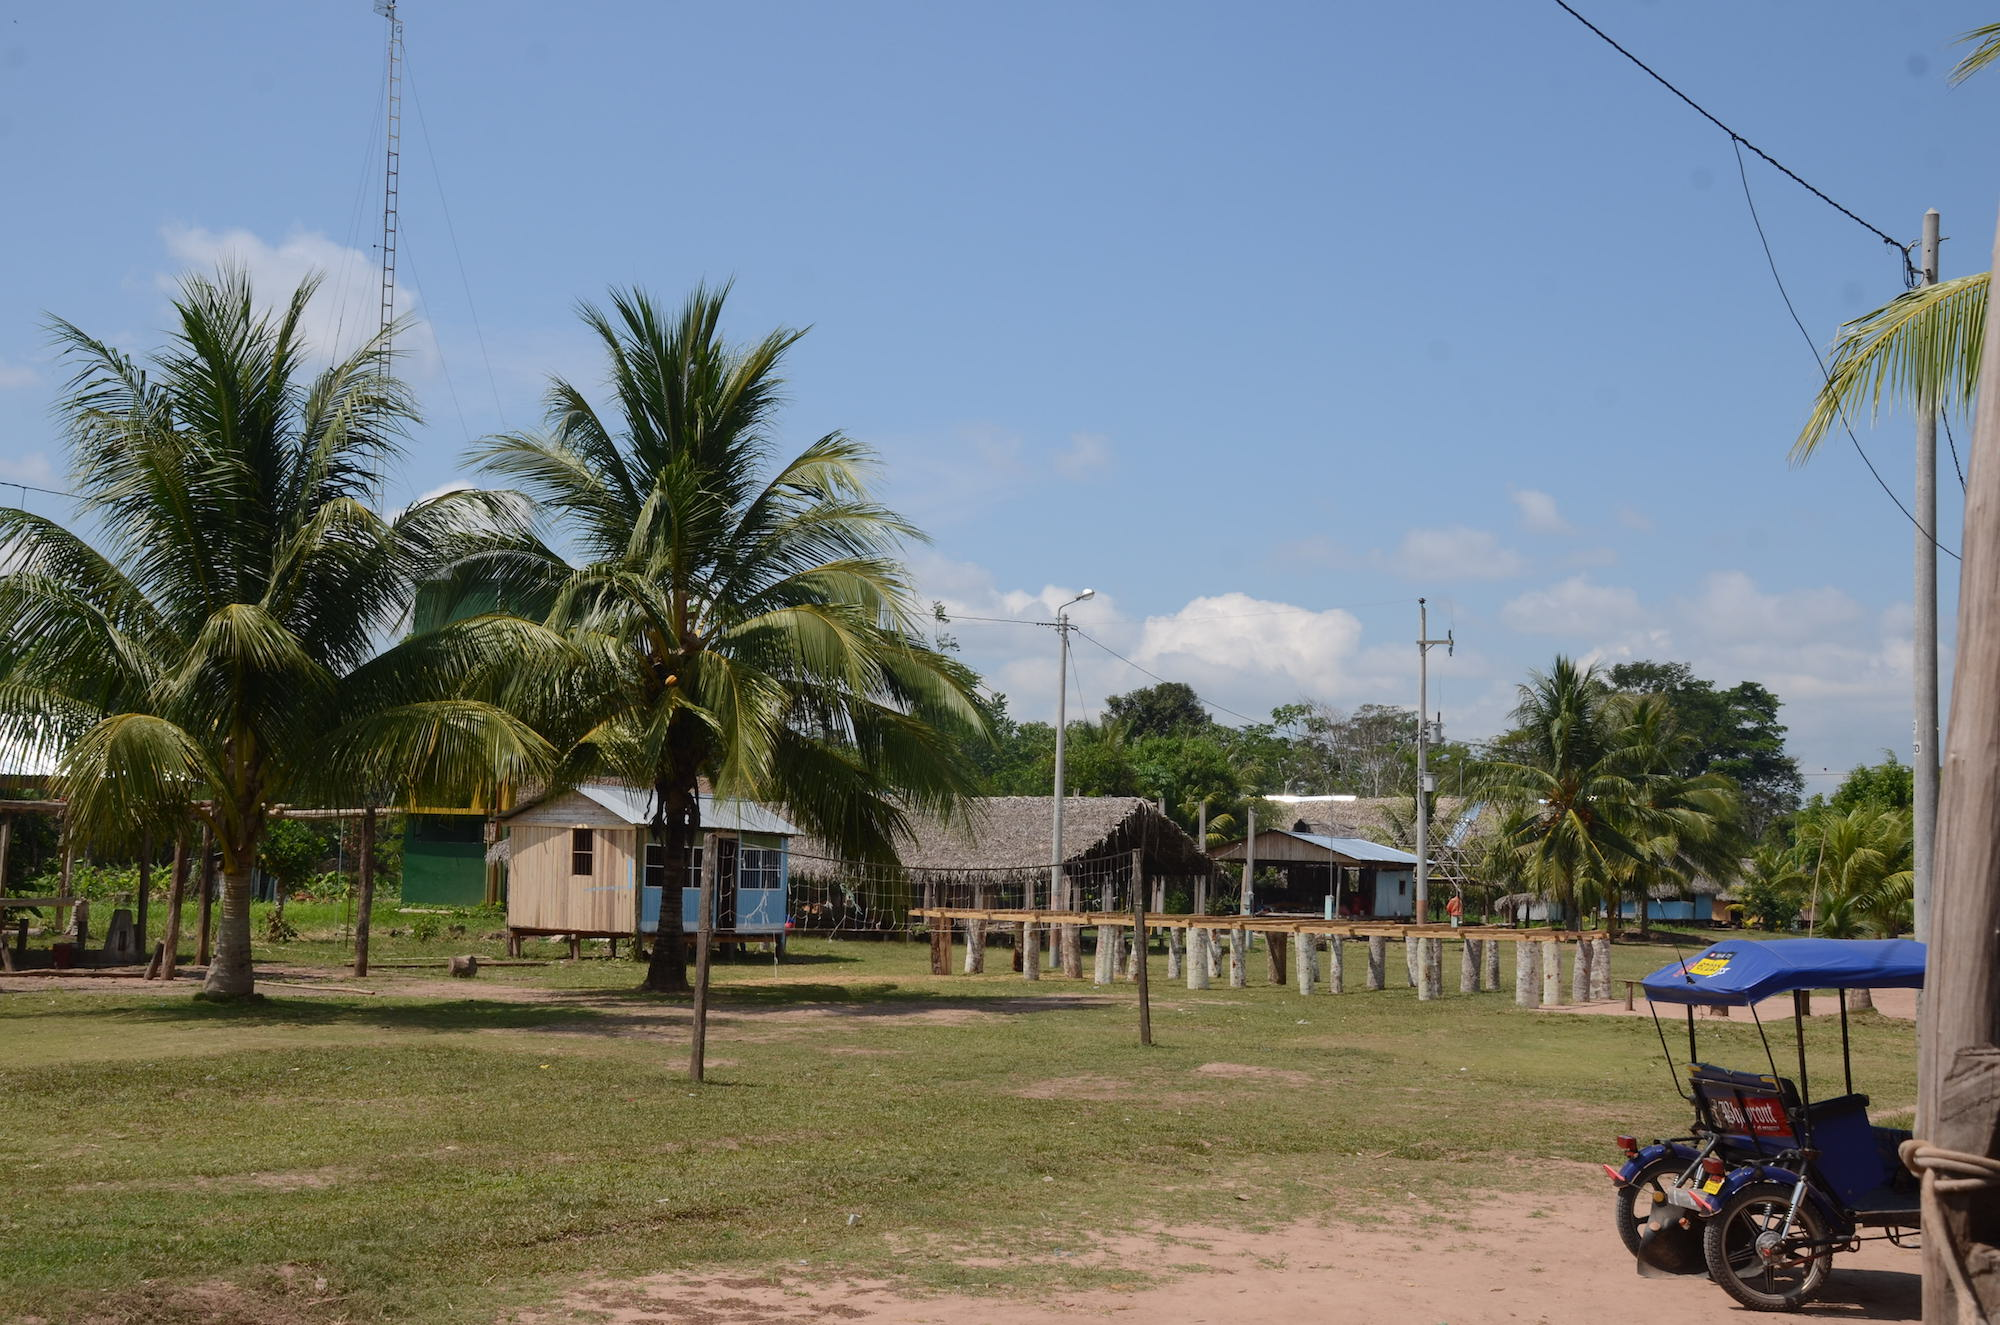 La comunidad nativa Santa Clara de Uchunya se enfrenta por su territorio a la empresa de palma Ochosur P. Foto: Yvette Sierra Praeli.